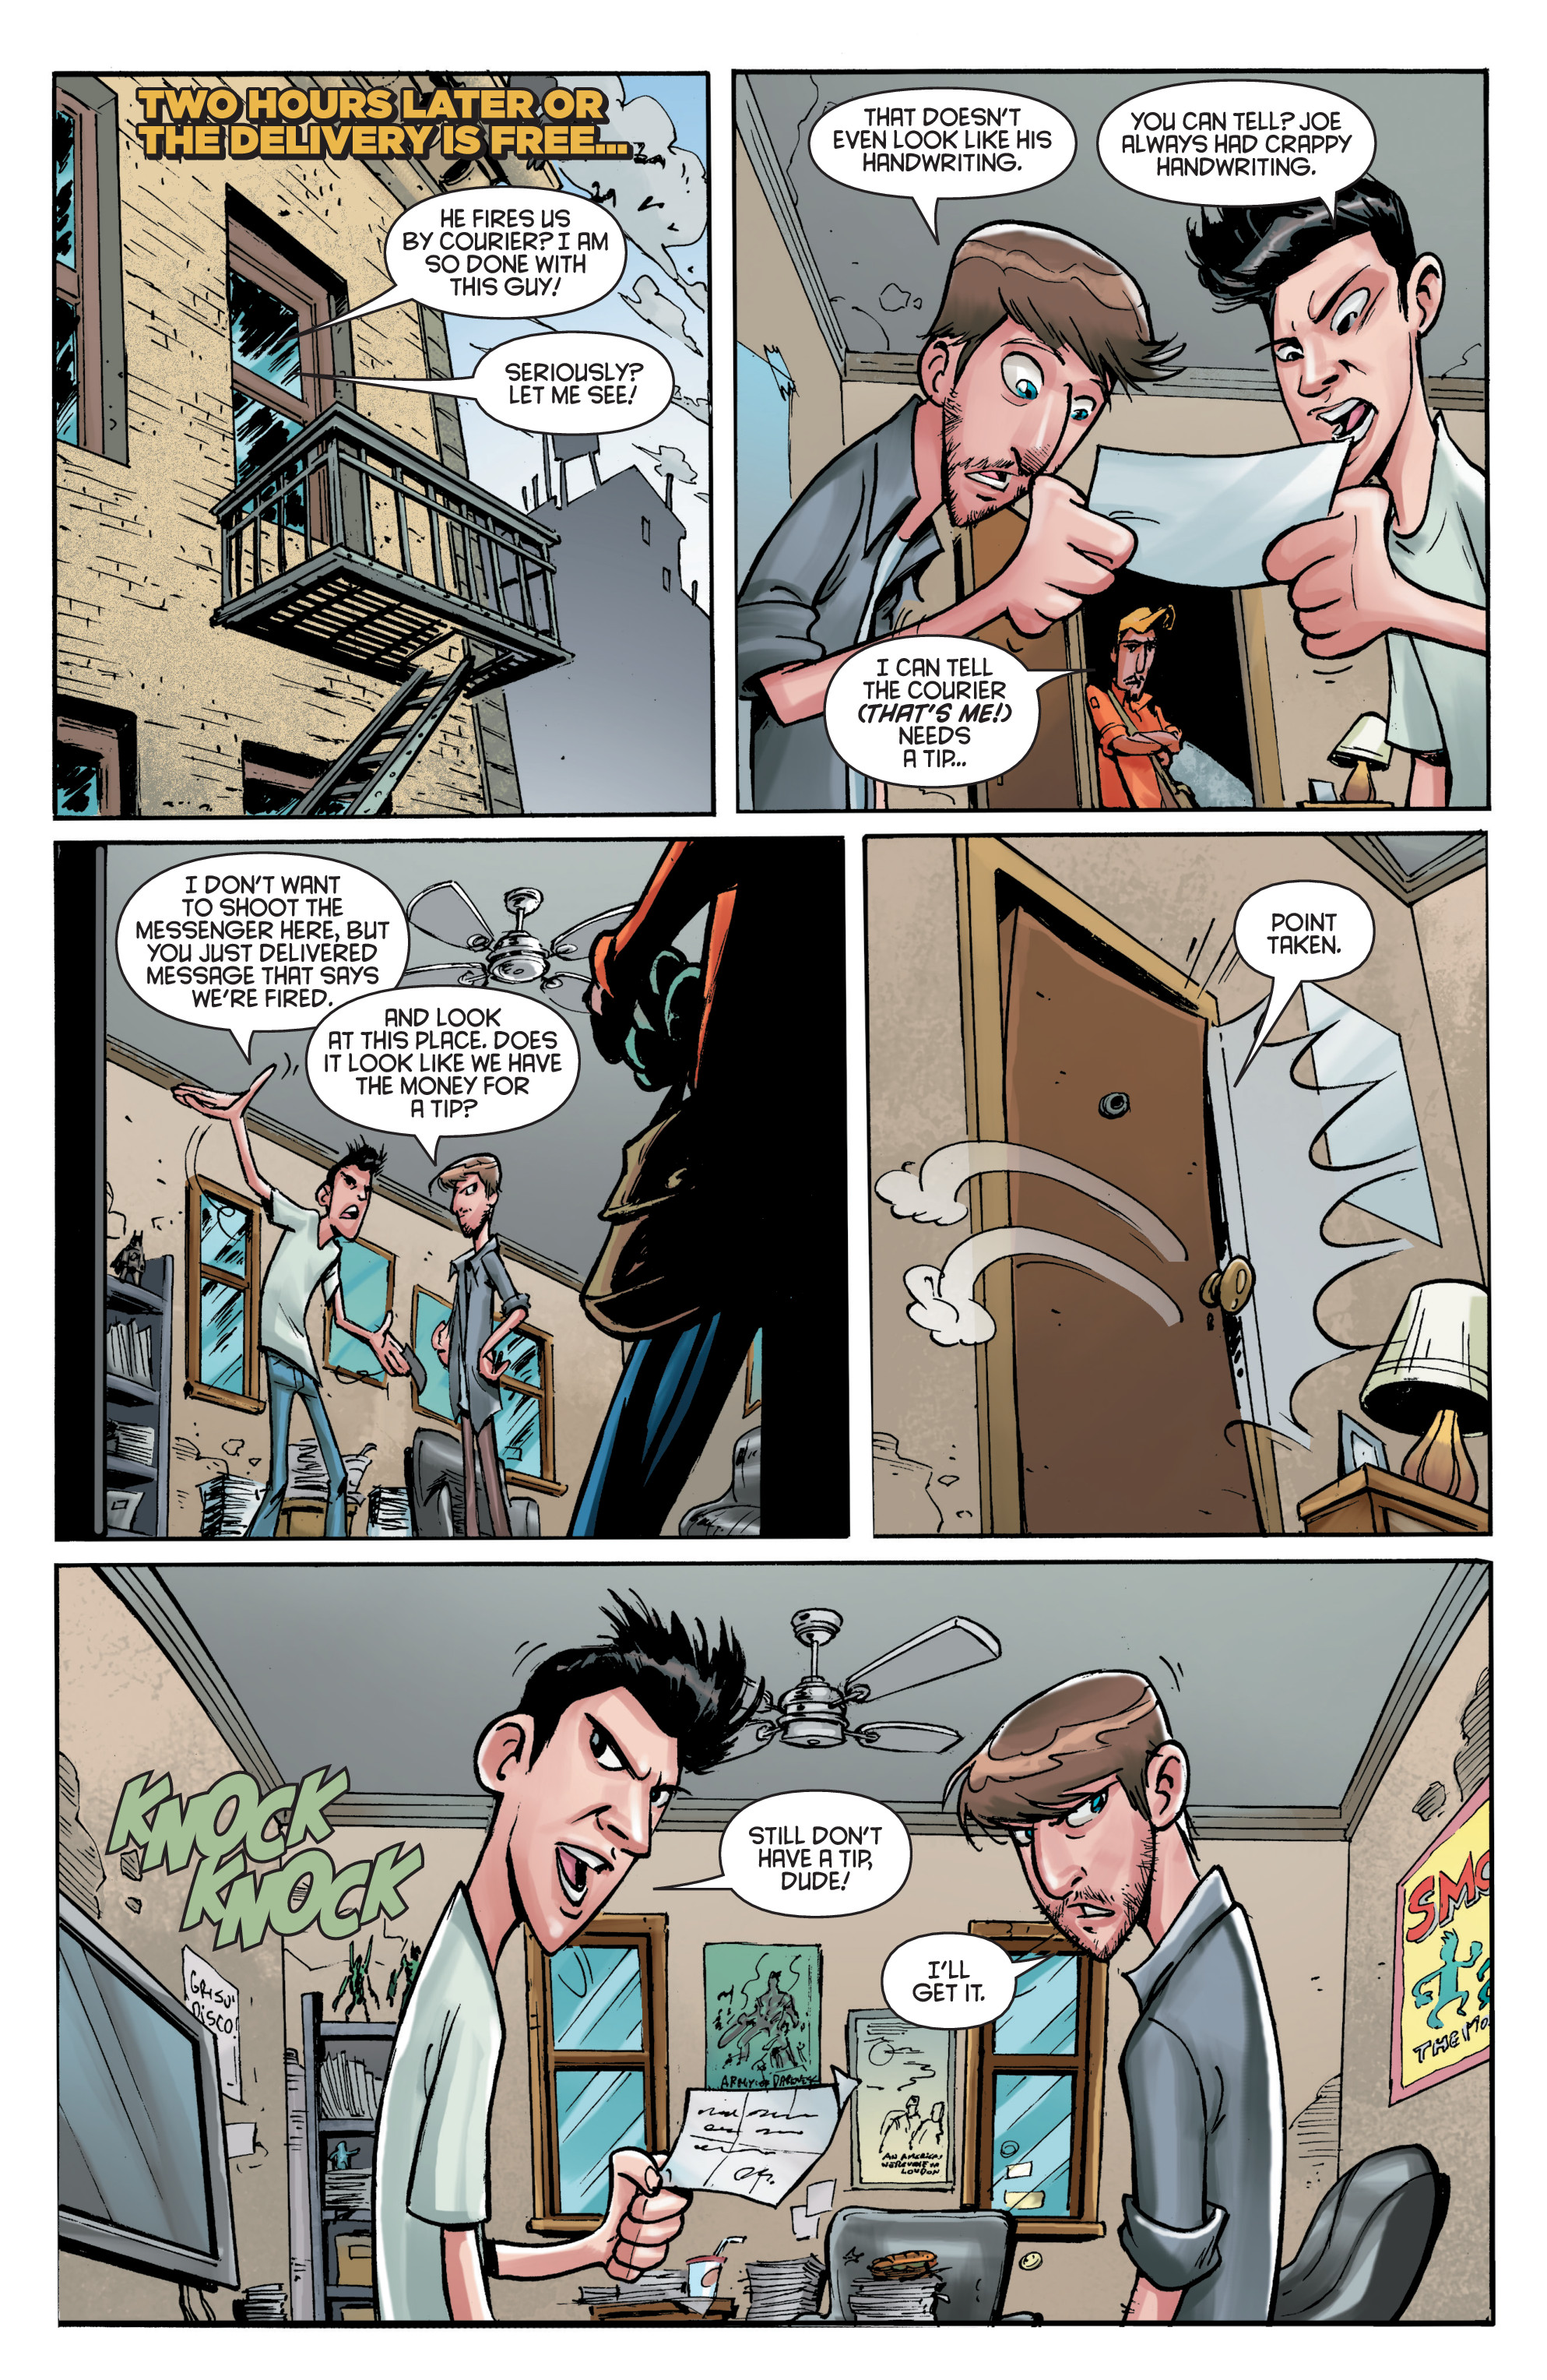 Read online Smosh comic -  Issue #5 - 23